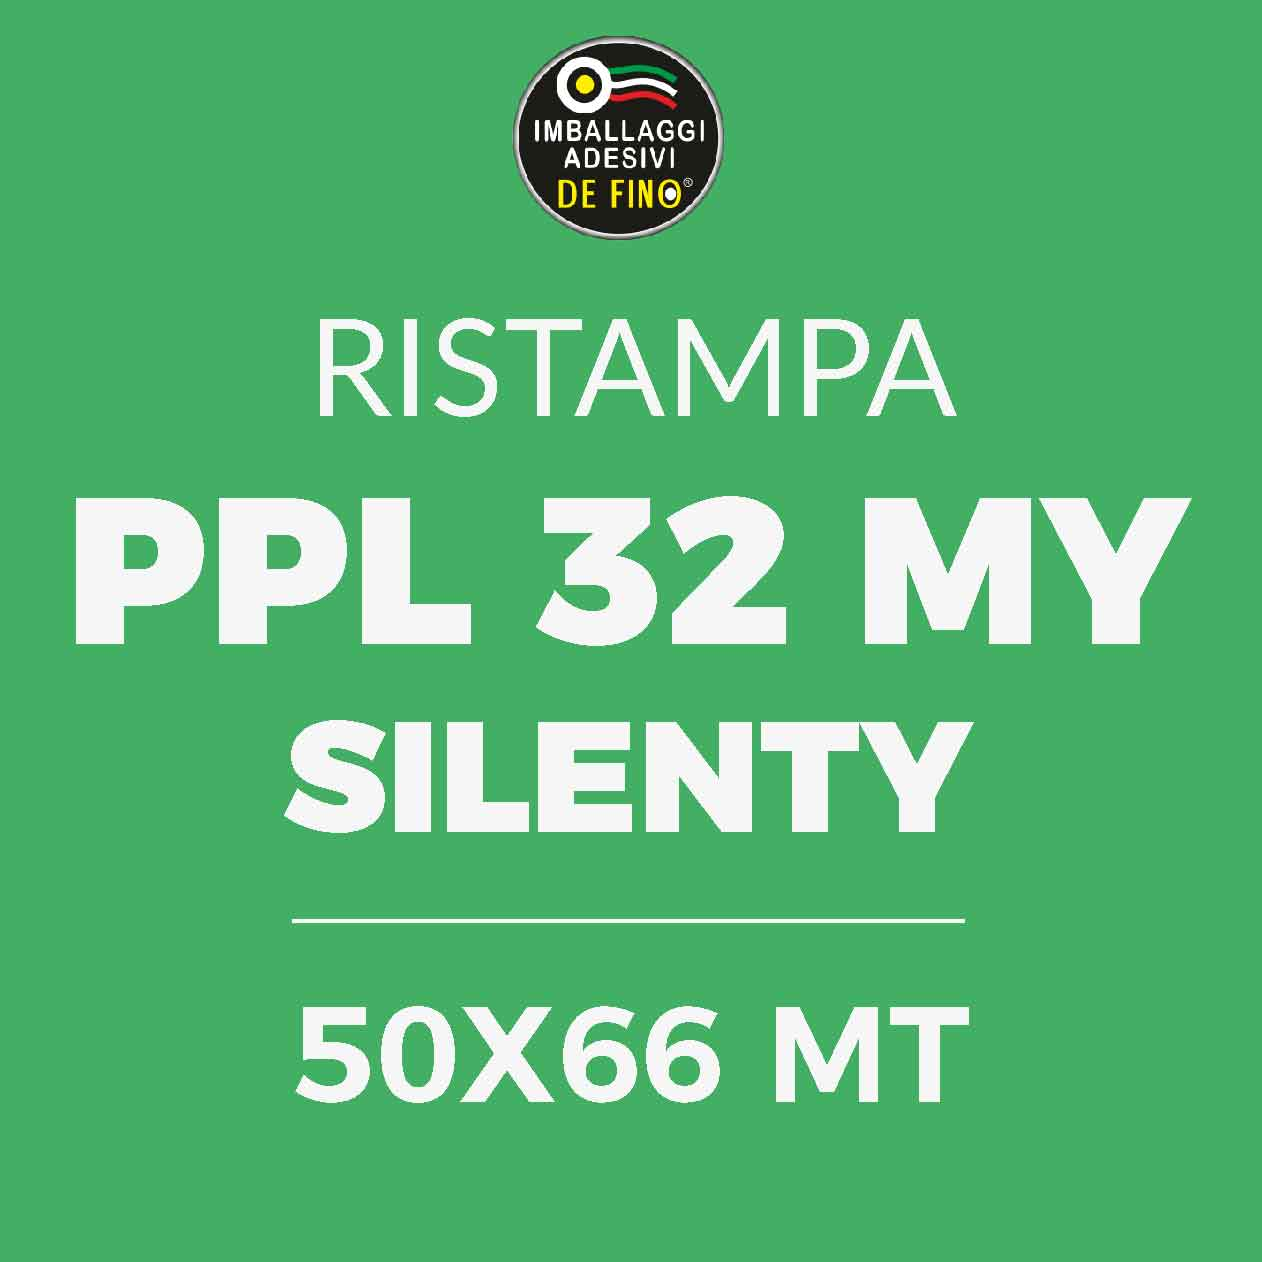 RISTAMPA PPL 50X66 MT - 01